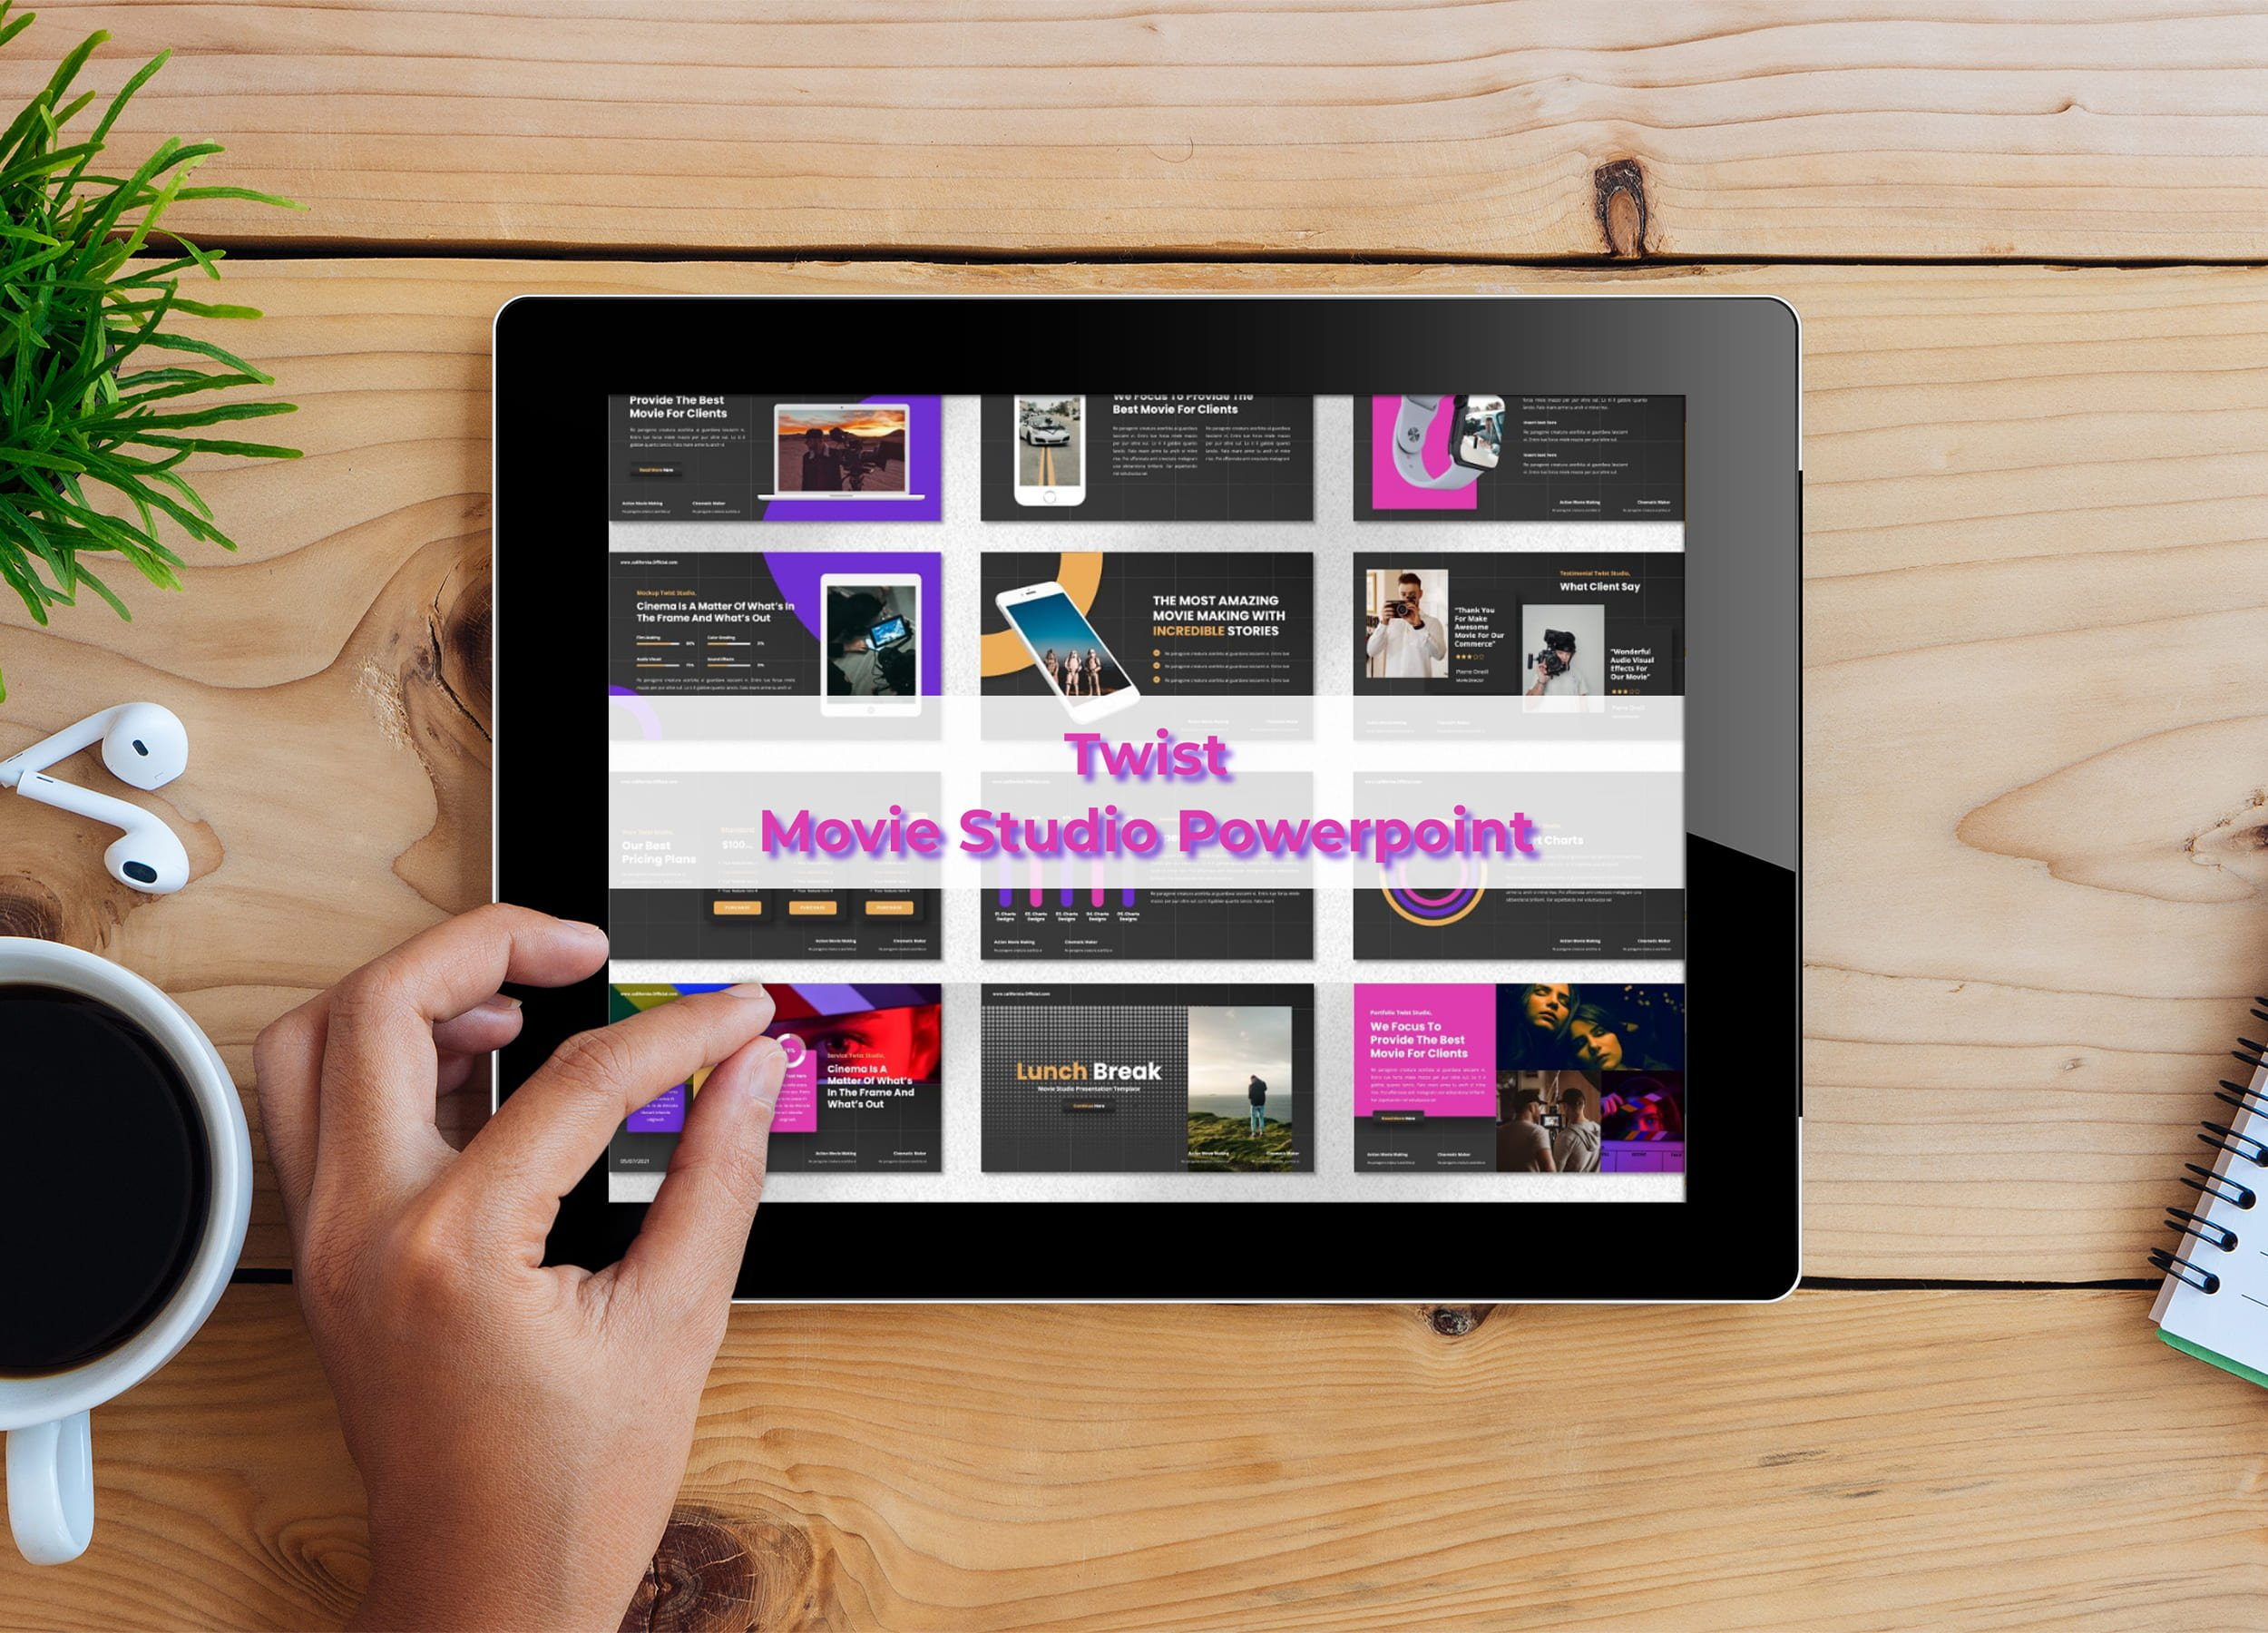 Tablet option of the Twist - Movie Studio Powerpoint.